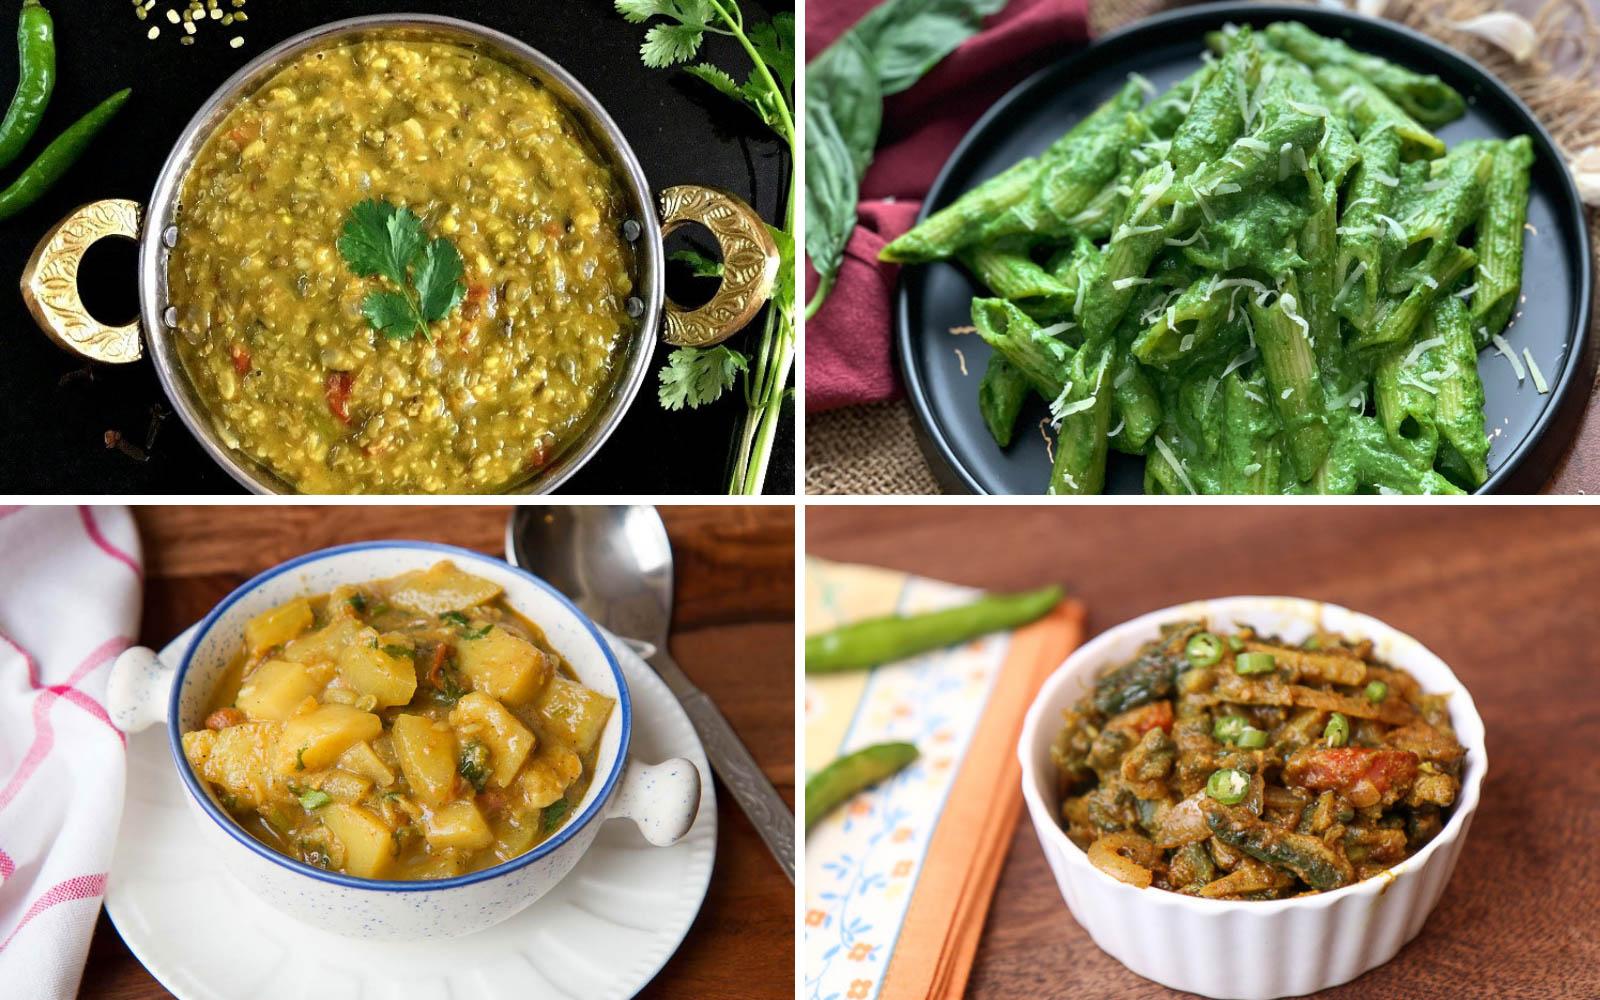 Office Lunch Box Menu Plan-Mung Dal Curry, Lauki Aloo Sabzi, Pasta In Spinach Basil Sauce & More